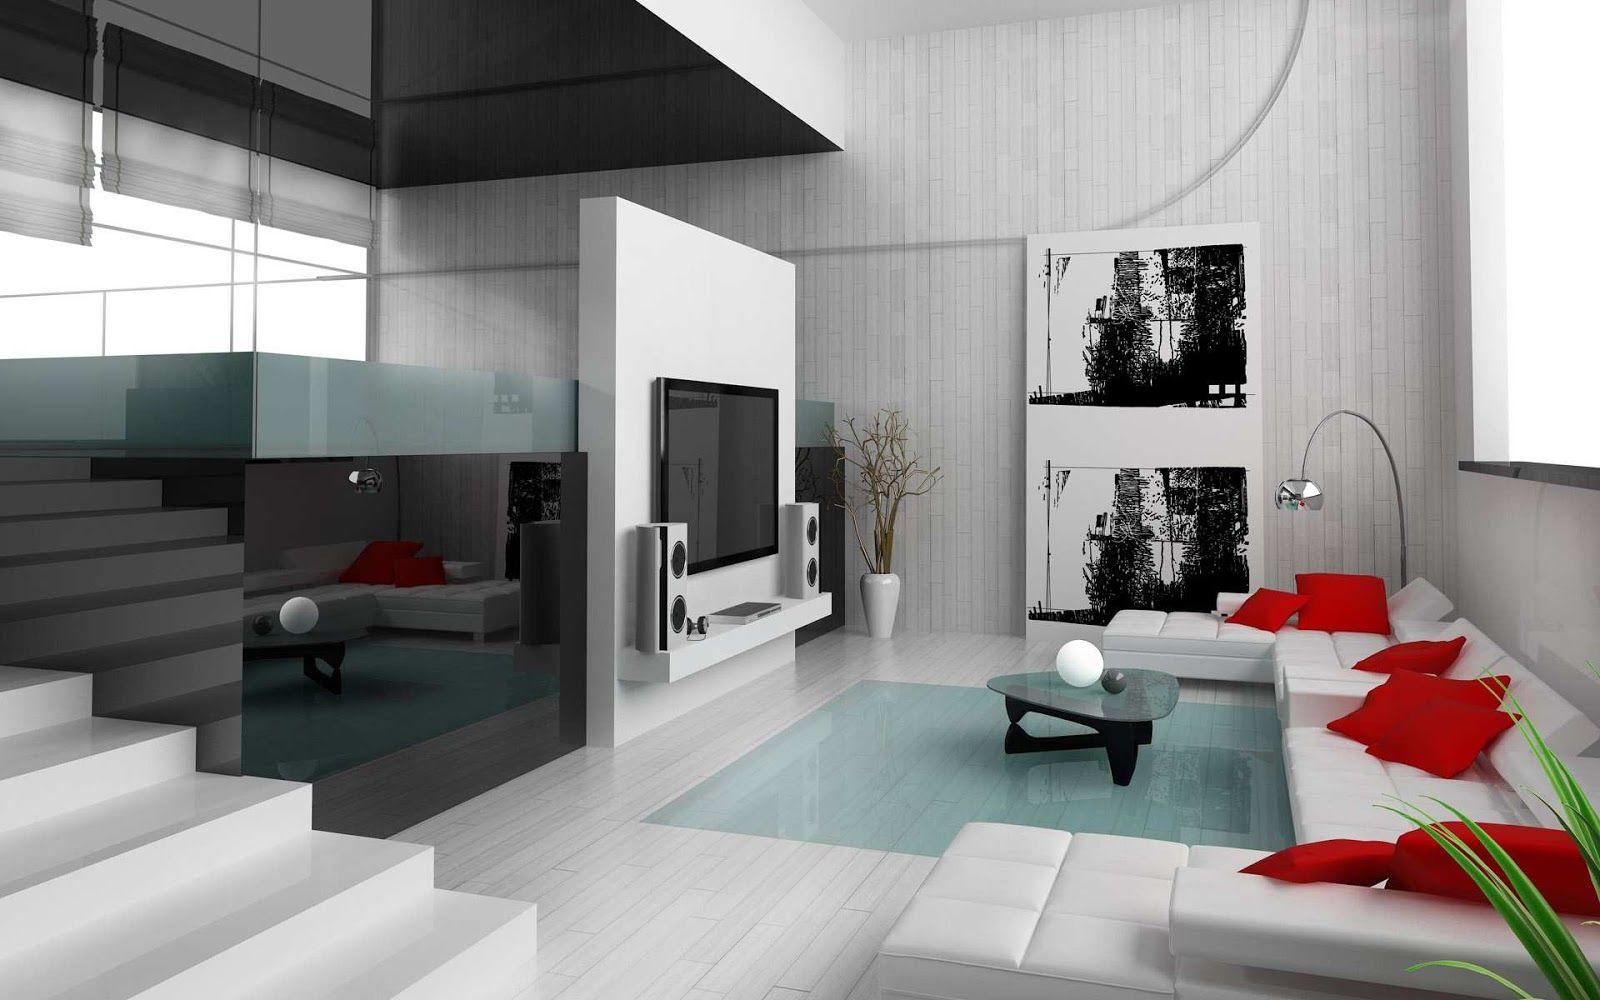 Living Room Home Interior Design Ideas 1000 images about great home interior design on pinterest and interiors